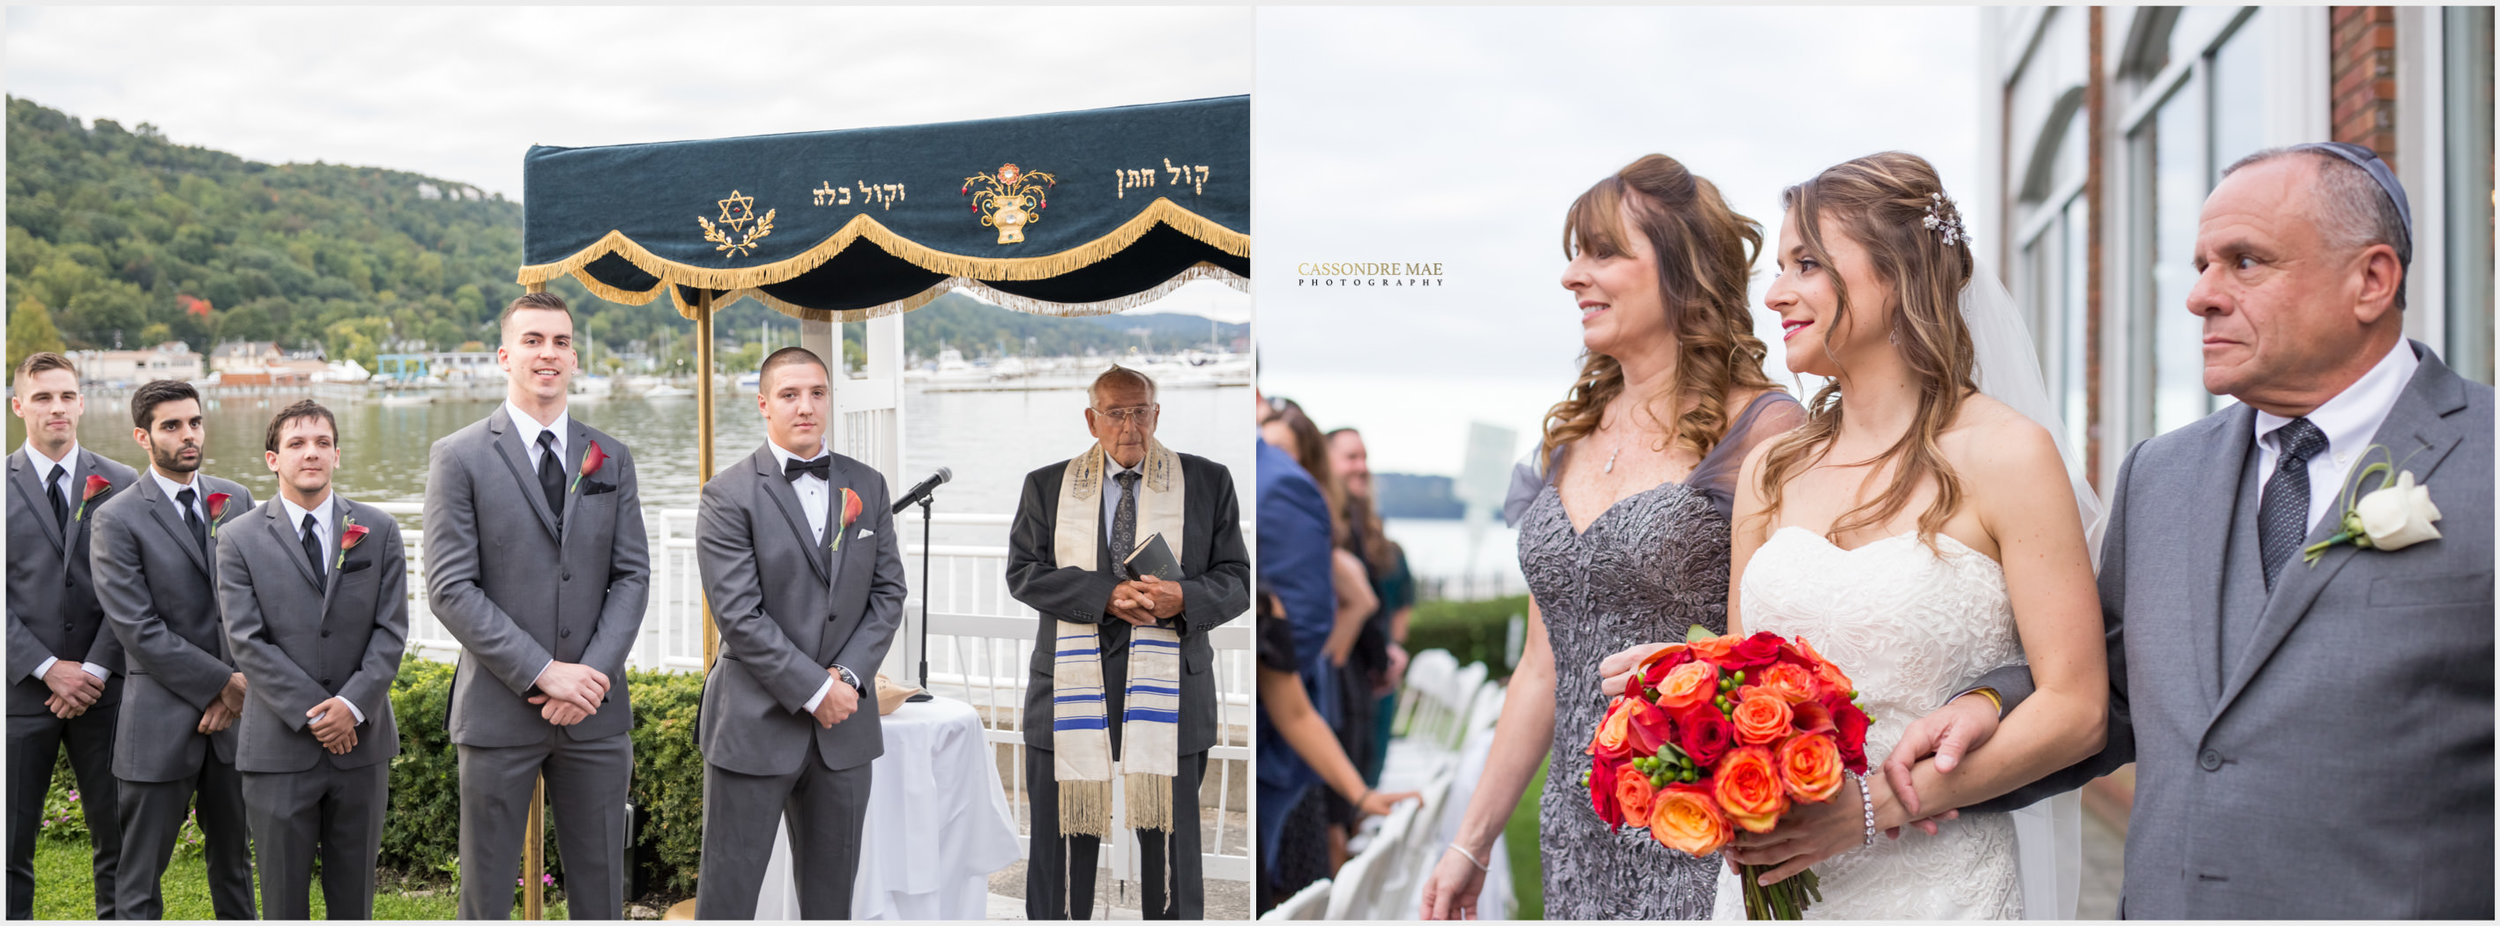 Views on the Hudson Wedding Photos Cassondre Mae Photography 17.jpg